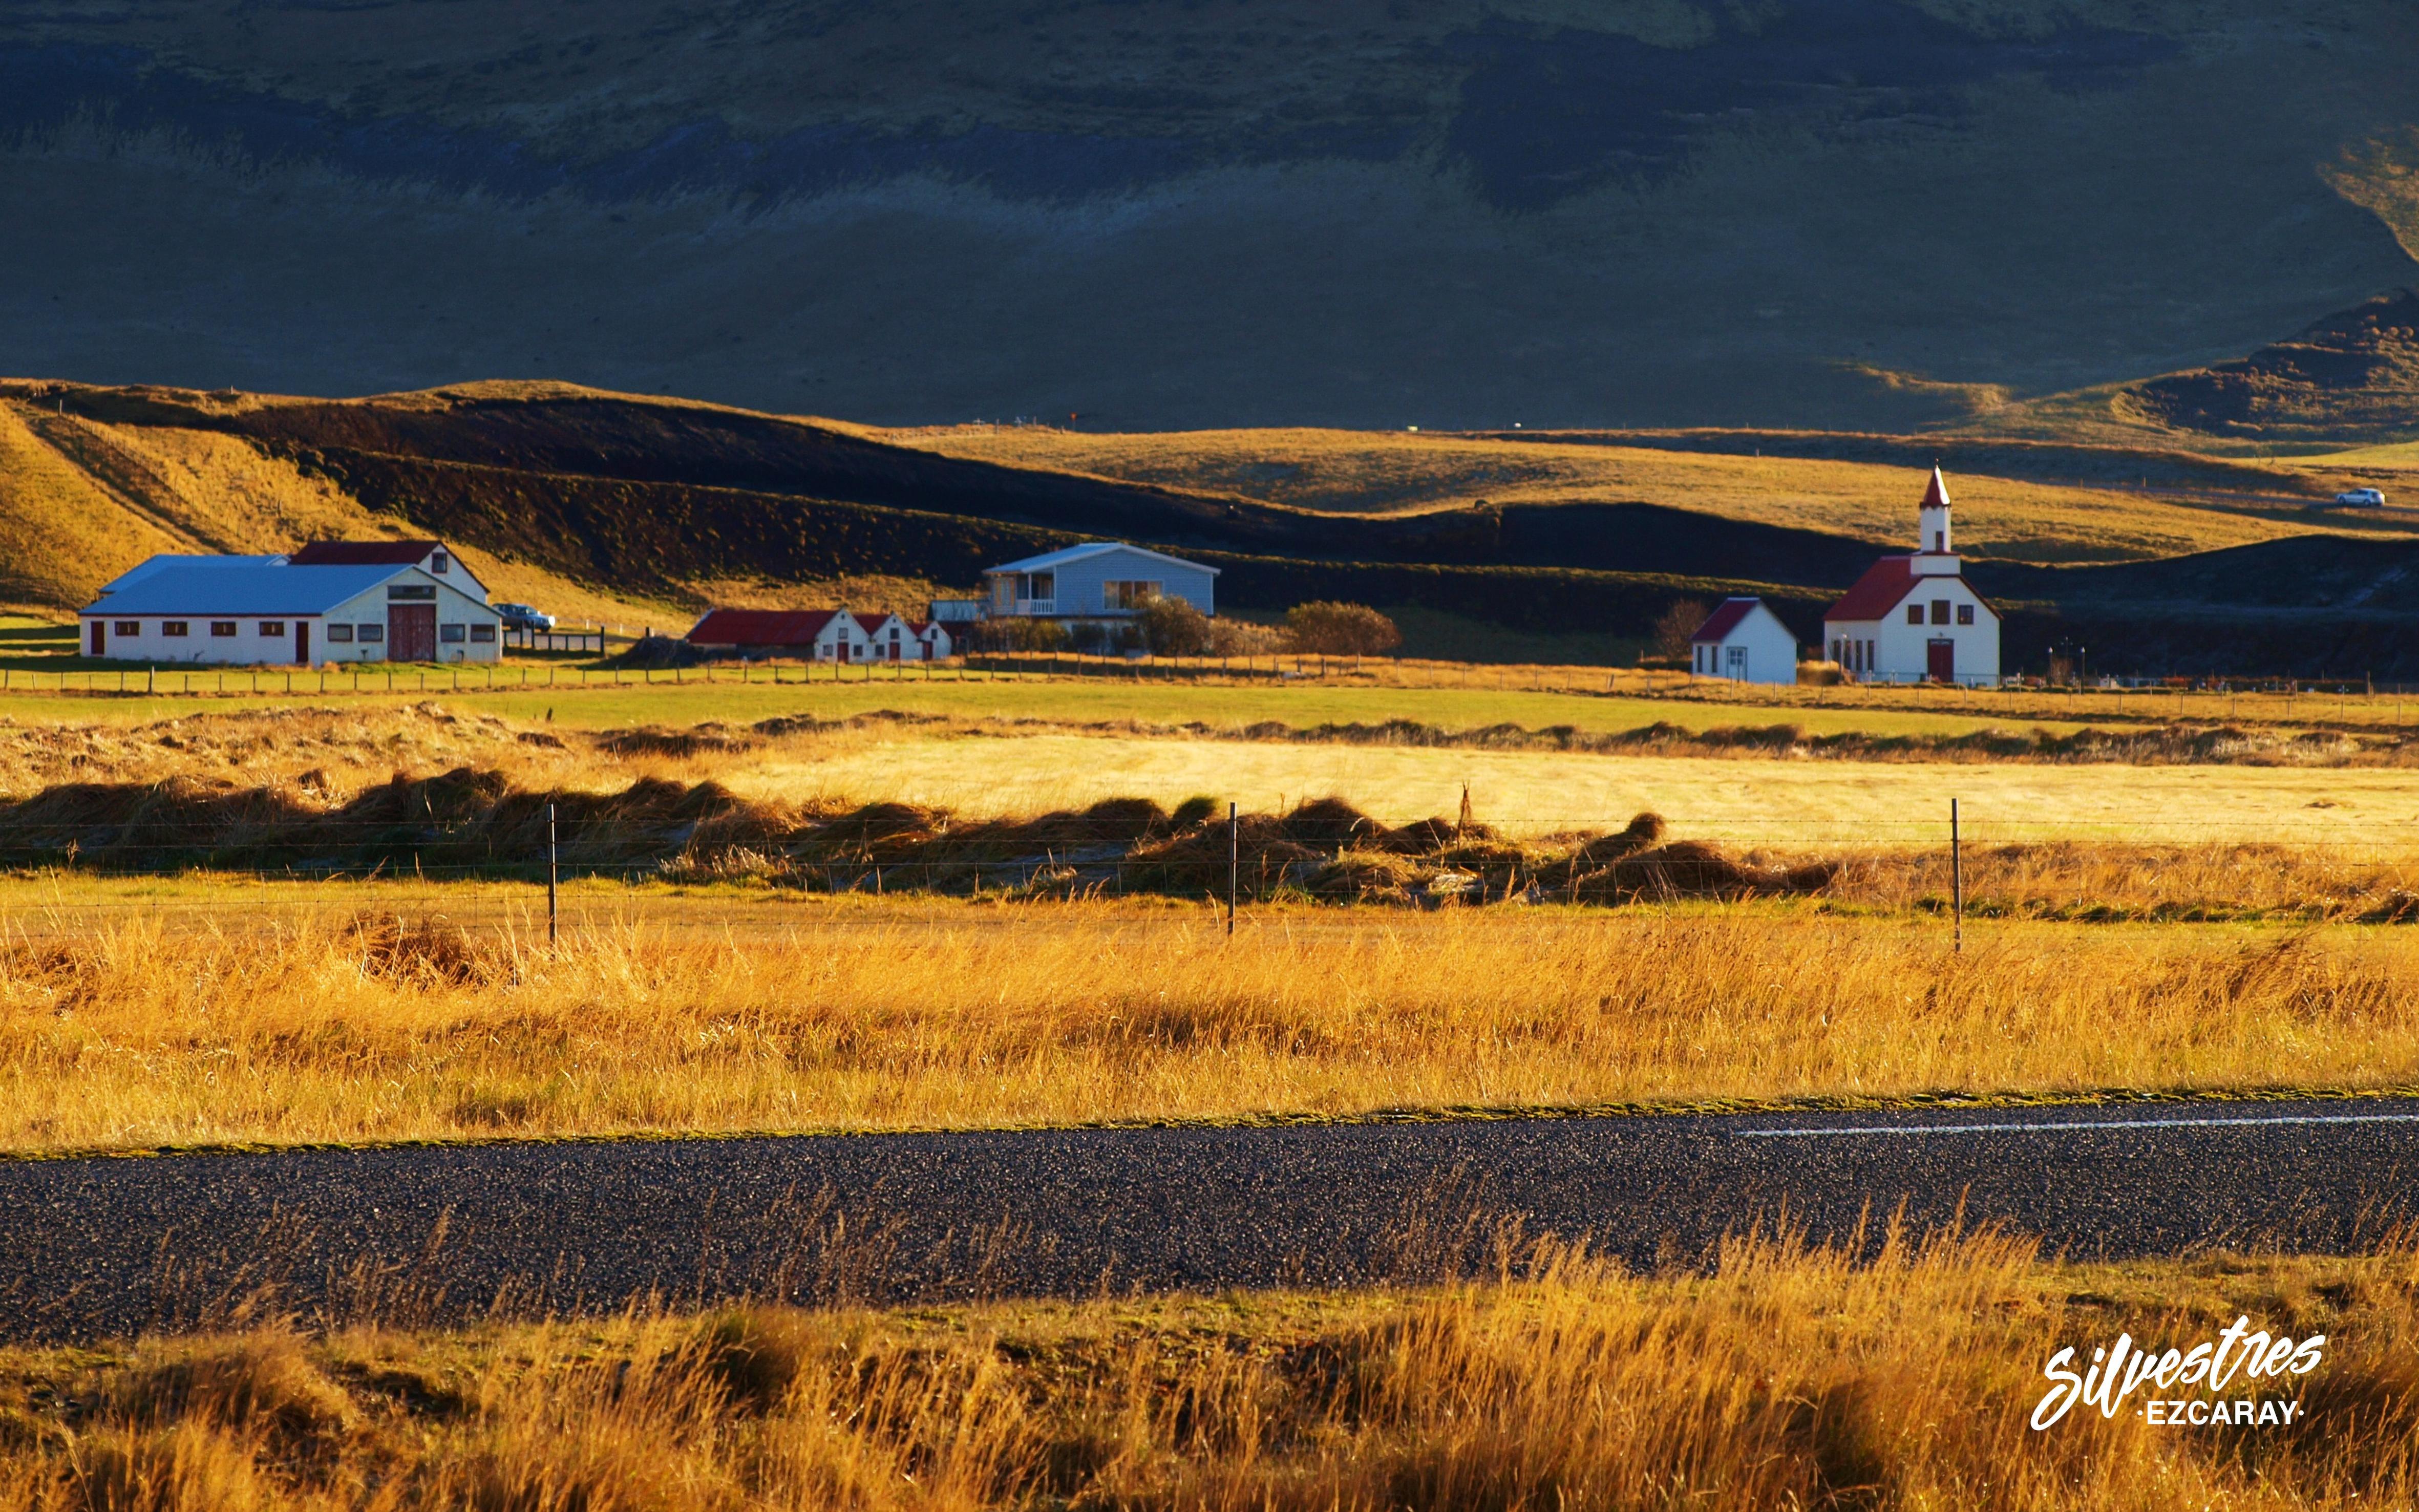 carreteras_roads_iceland_scenic_landscapes_granjas_farms_viajes_alojamientos